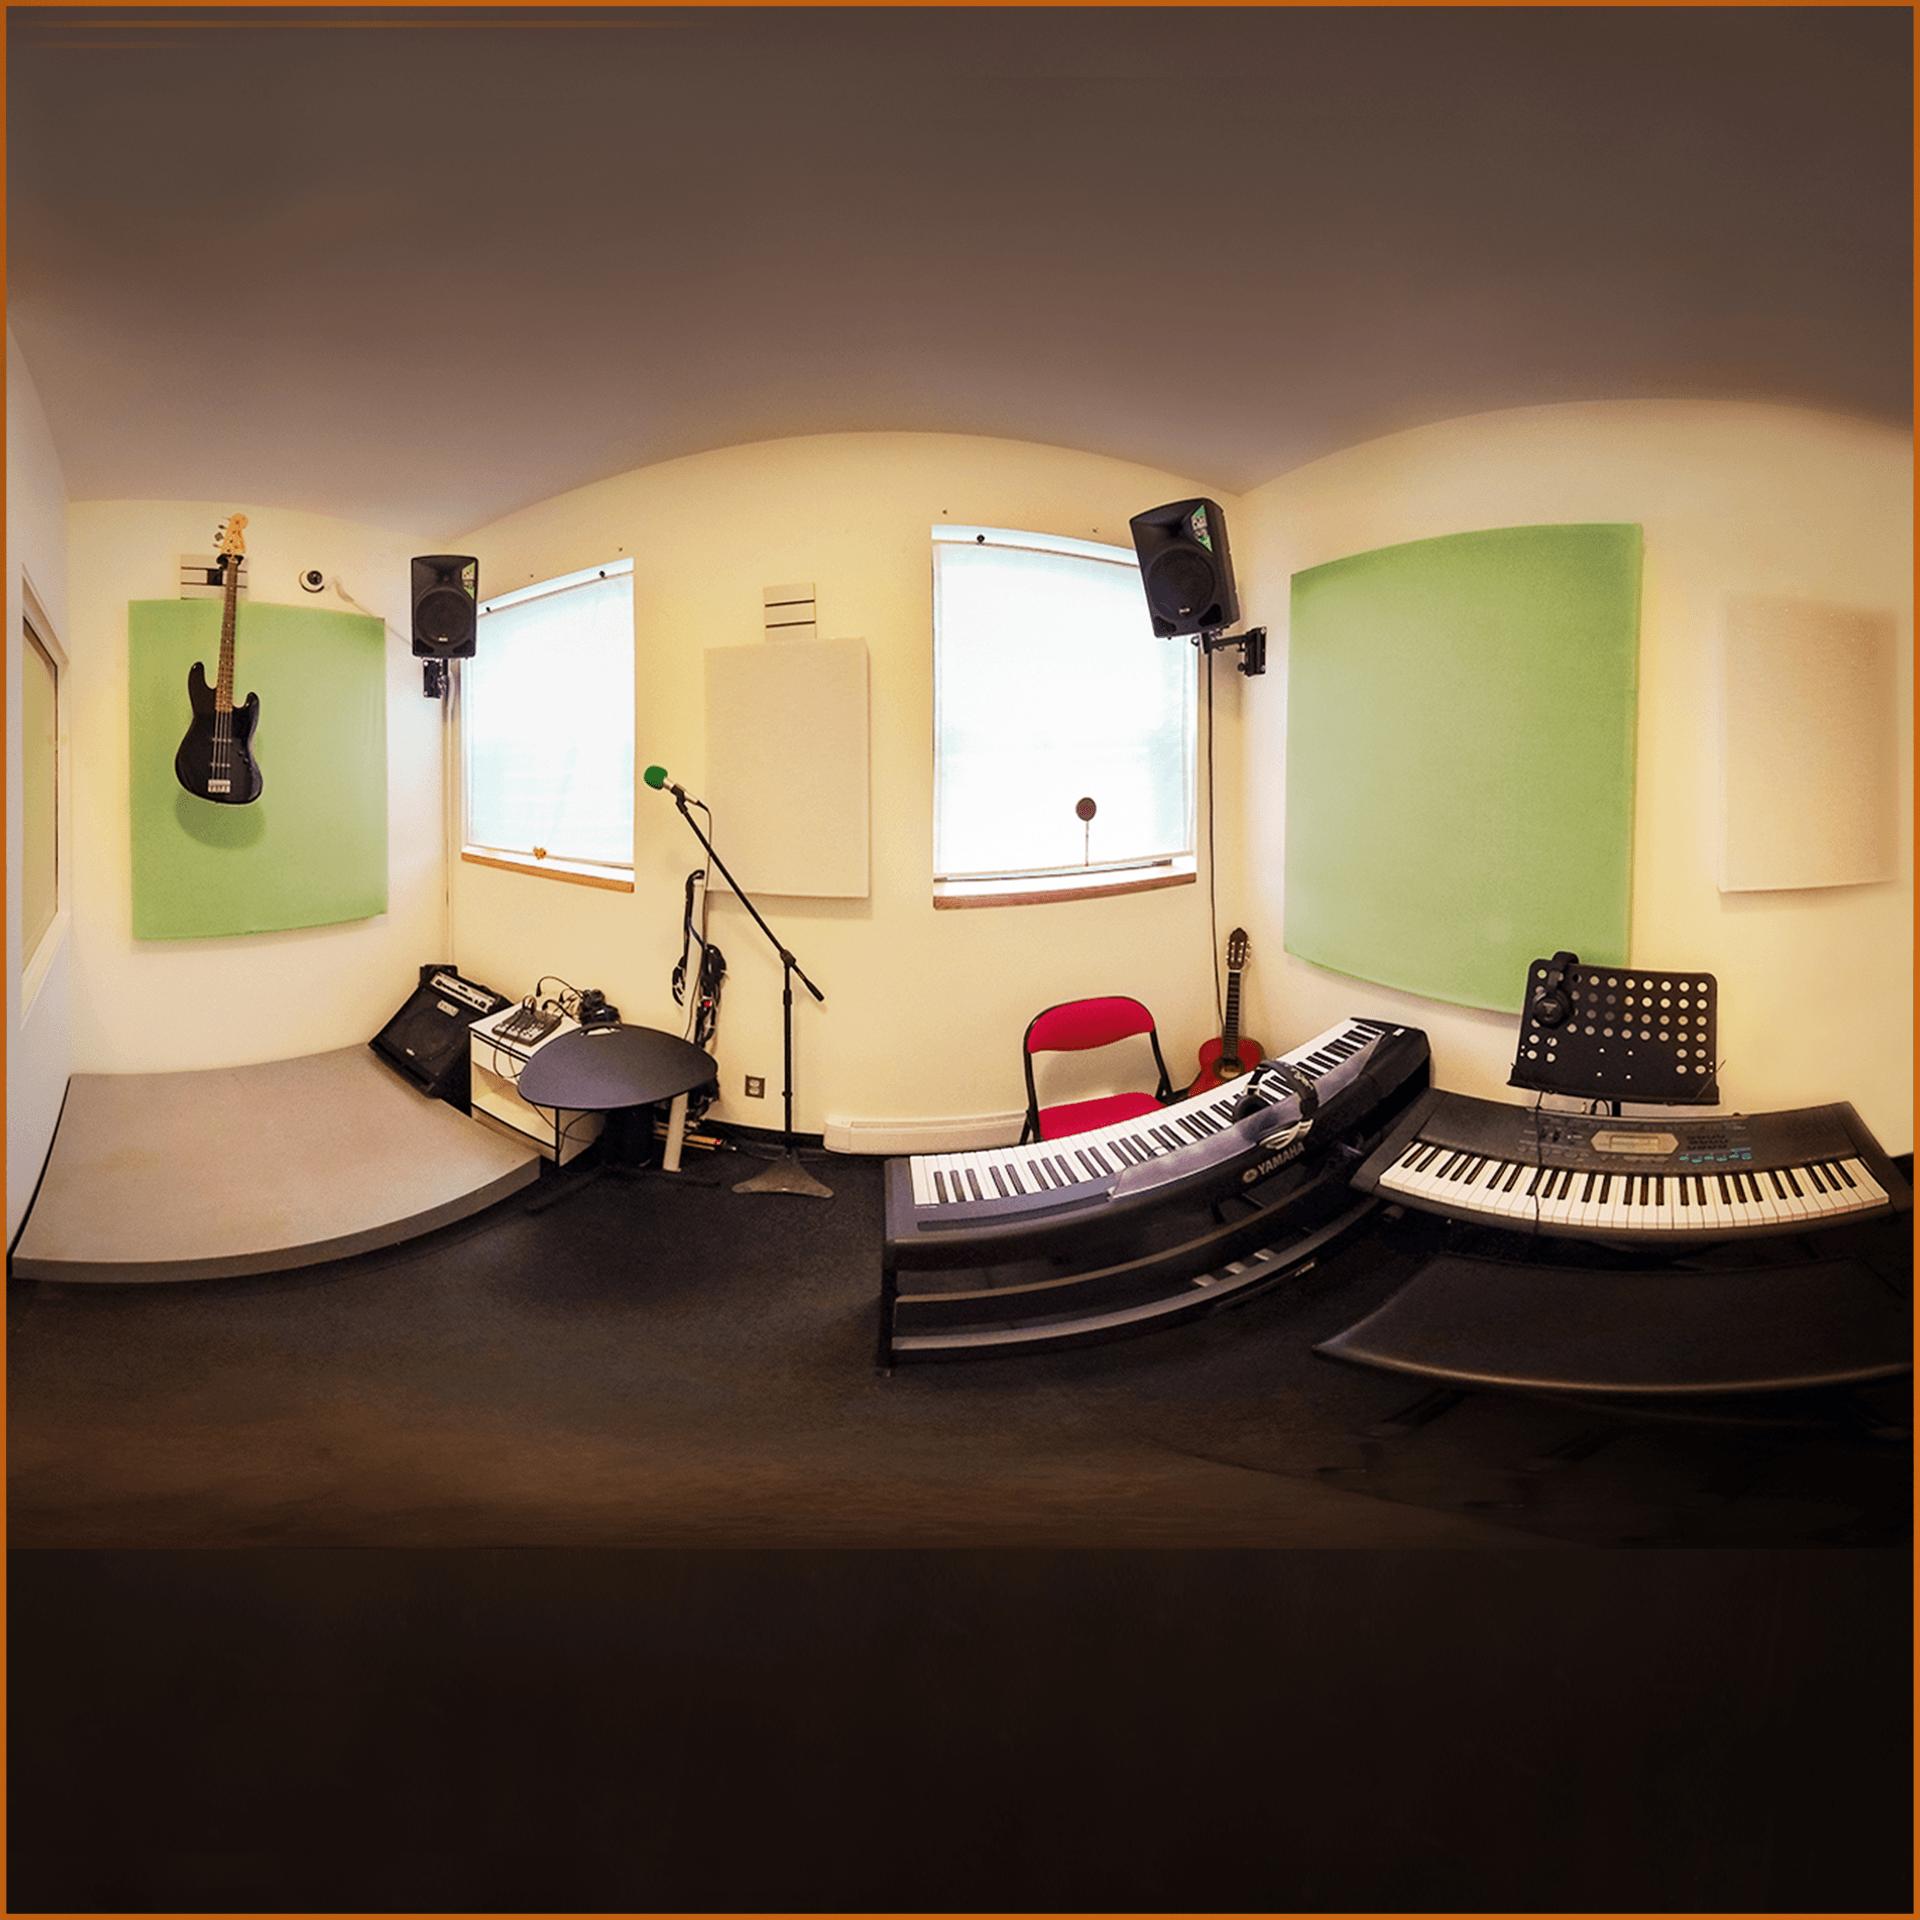 Studio Emin offrant polyvalence des instruments